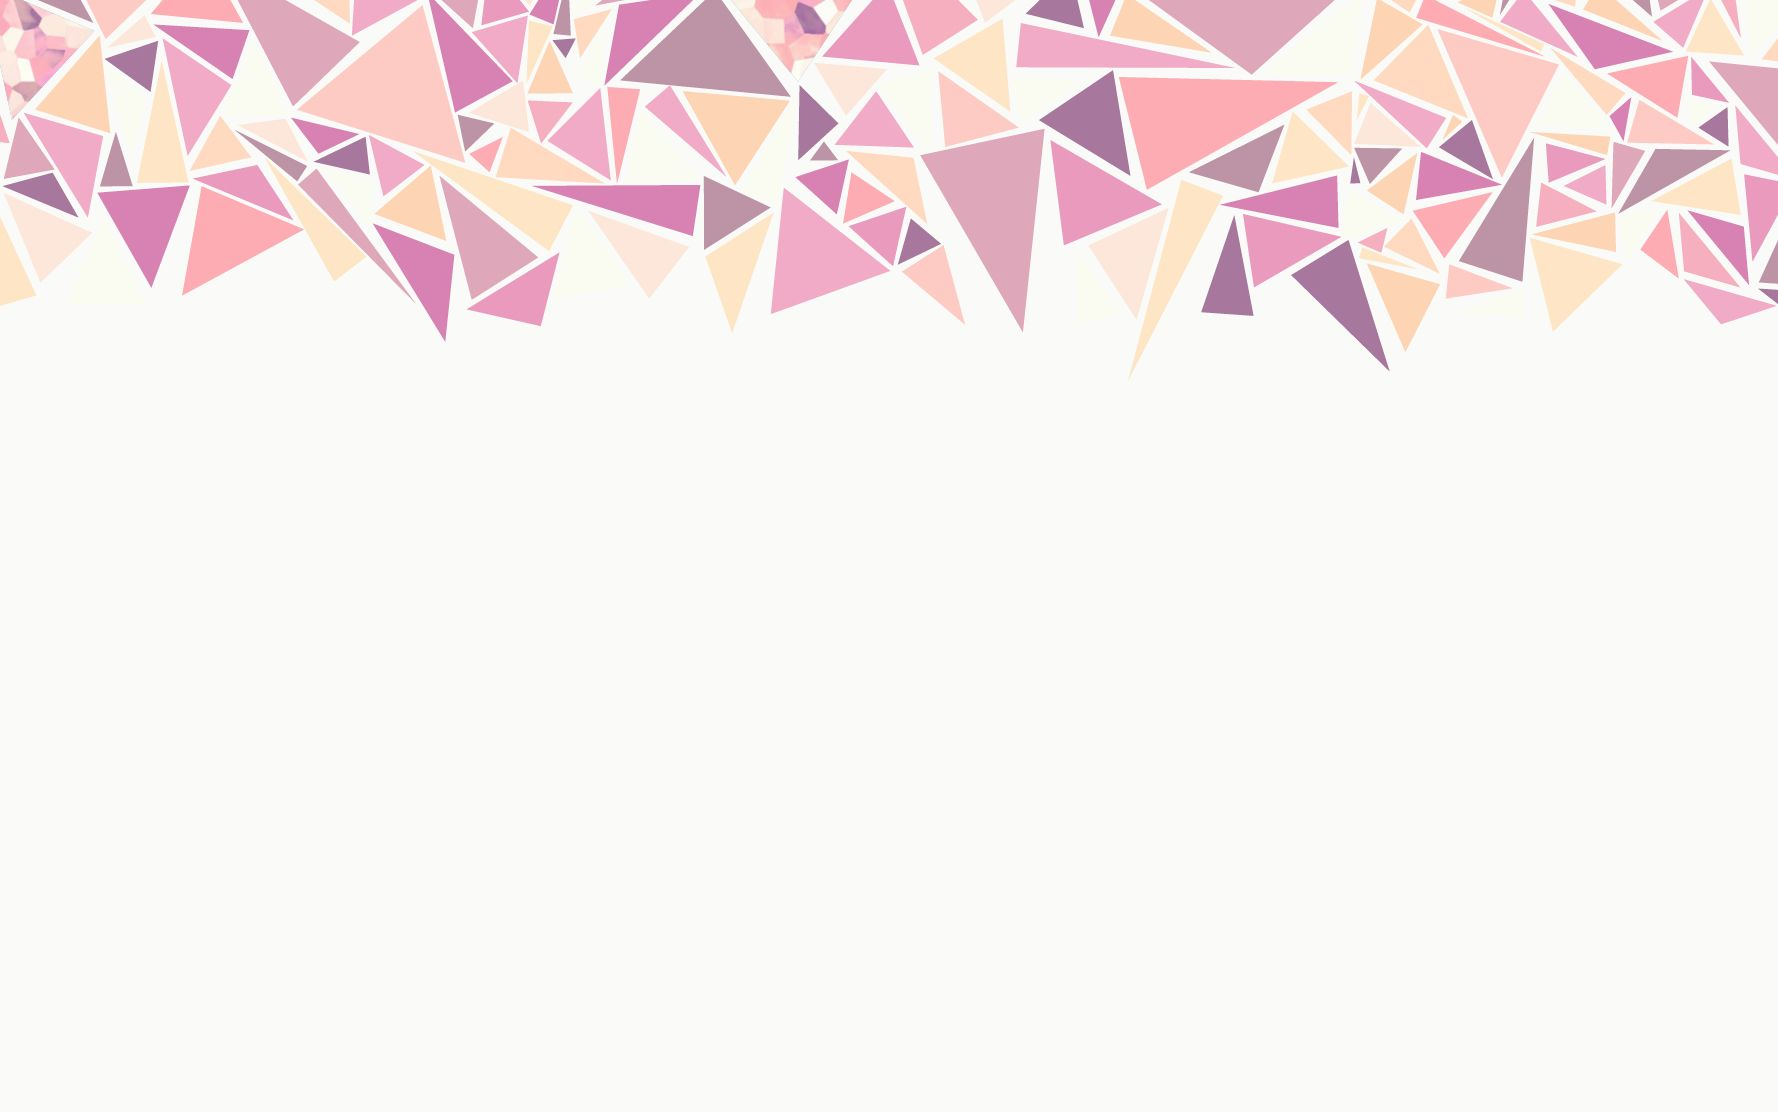 tumblr backgrounds background - photo #33